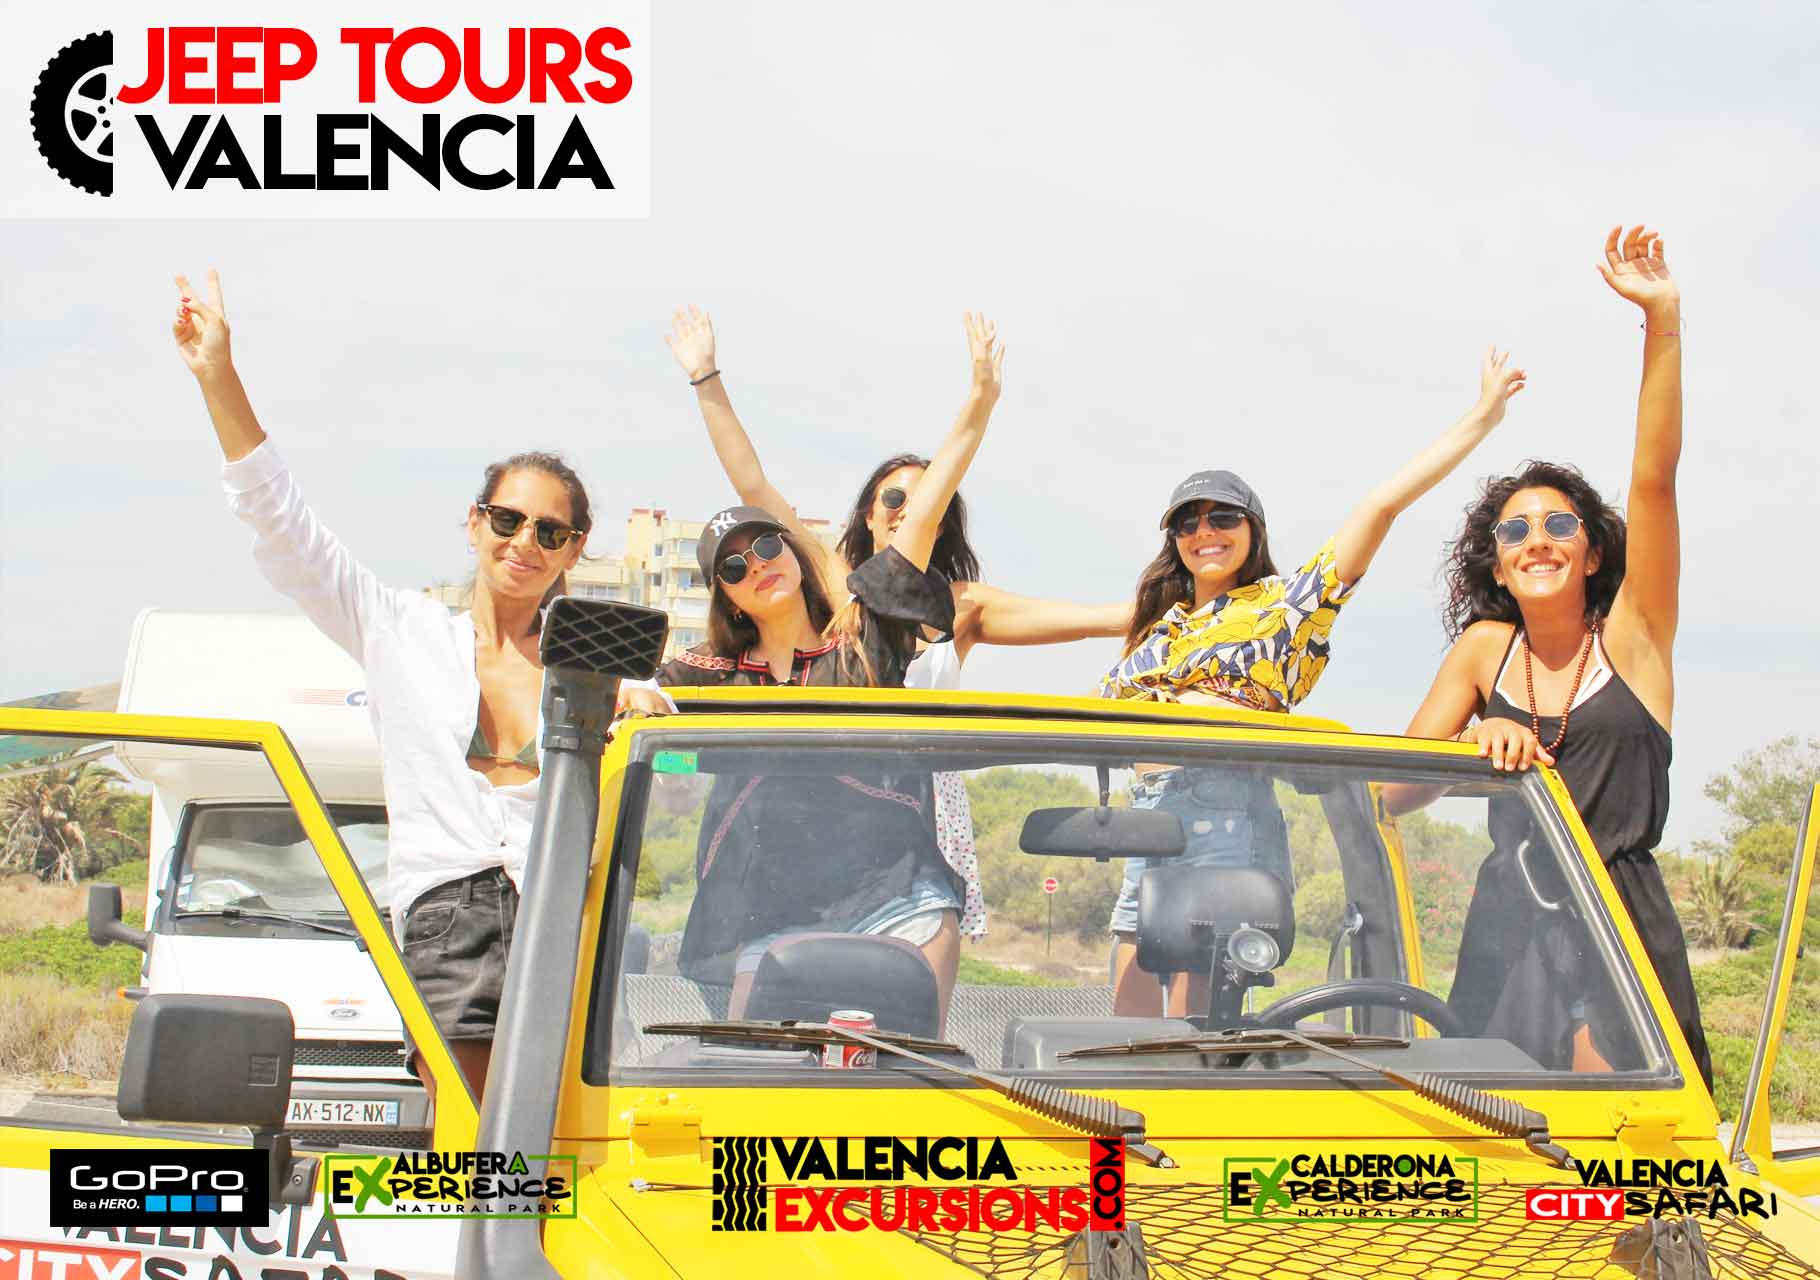 Touren durch den  Albufera Park mit jeeps. Reisfelder, Strand, Paella Albufera EXperience Jeep Tour Valencia